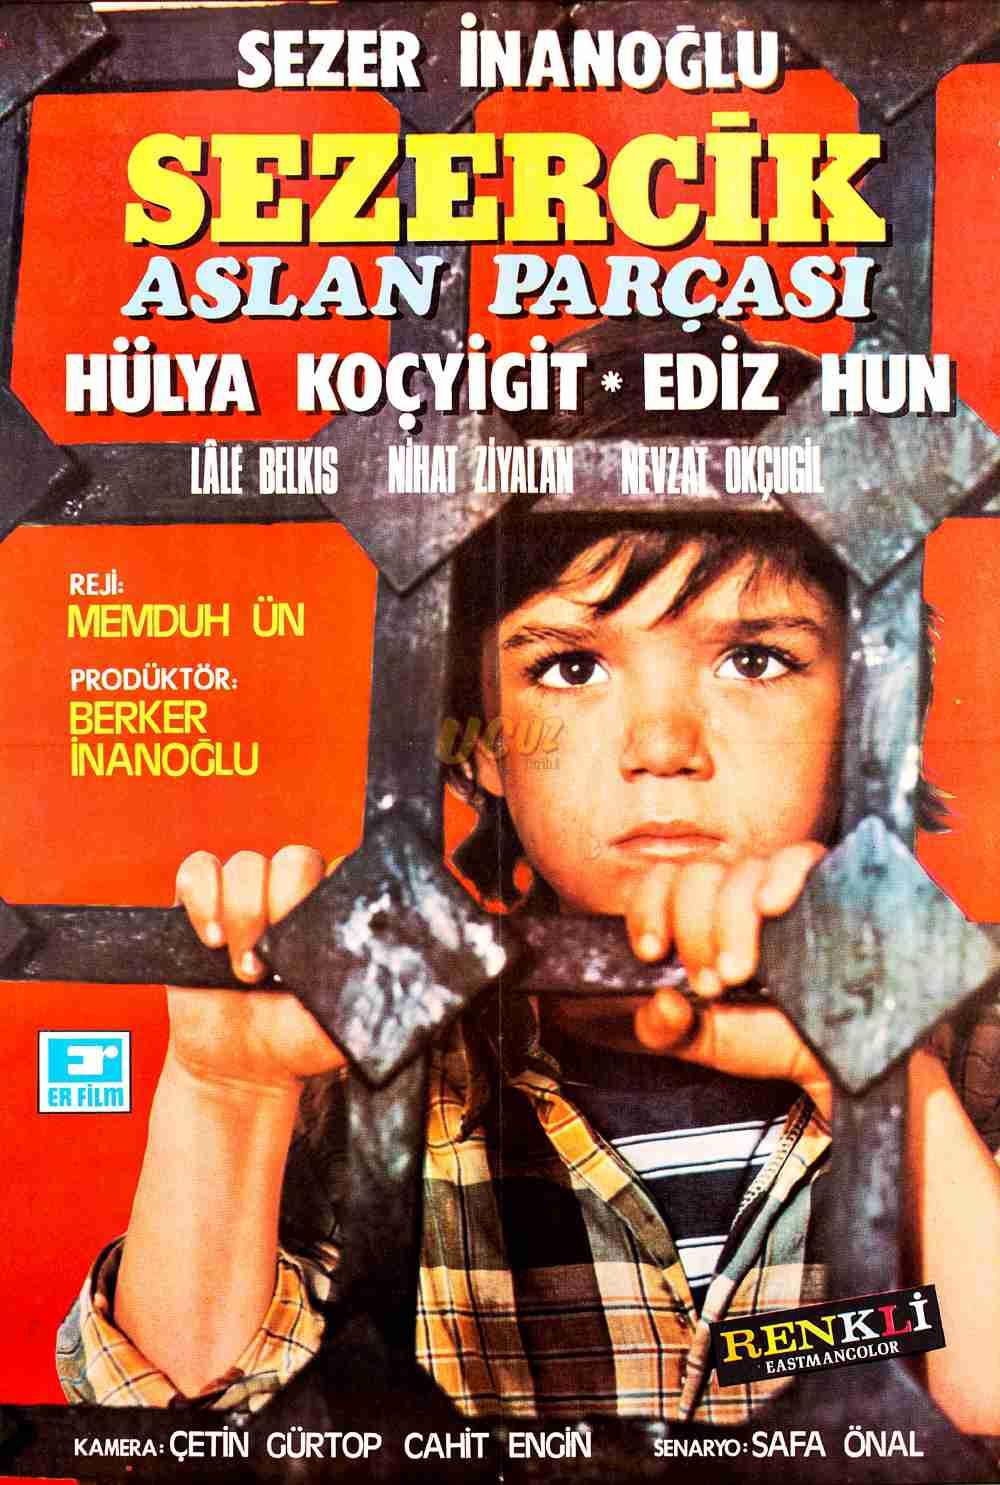 sezercik_aslan_parcasi_1972-3